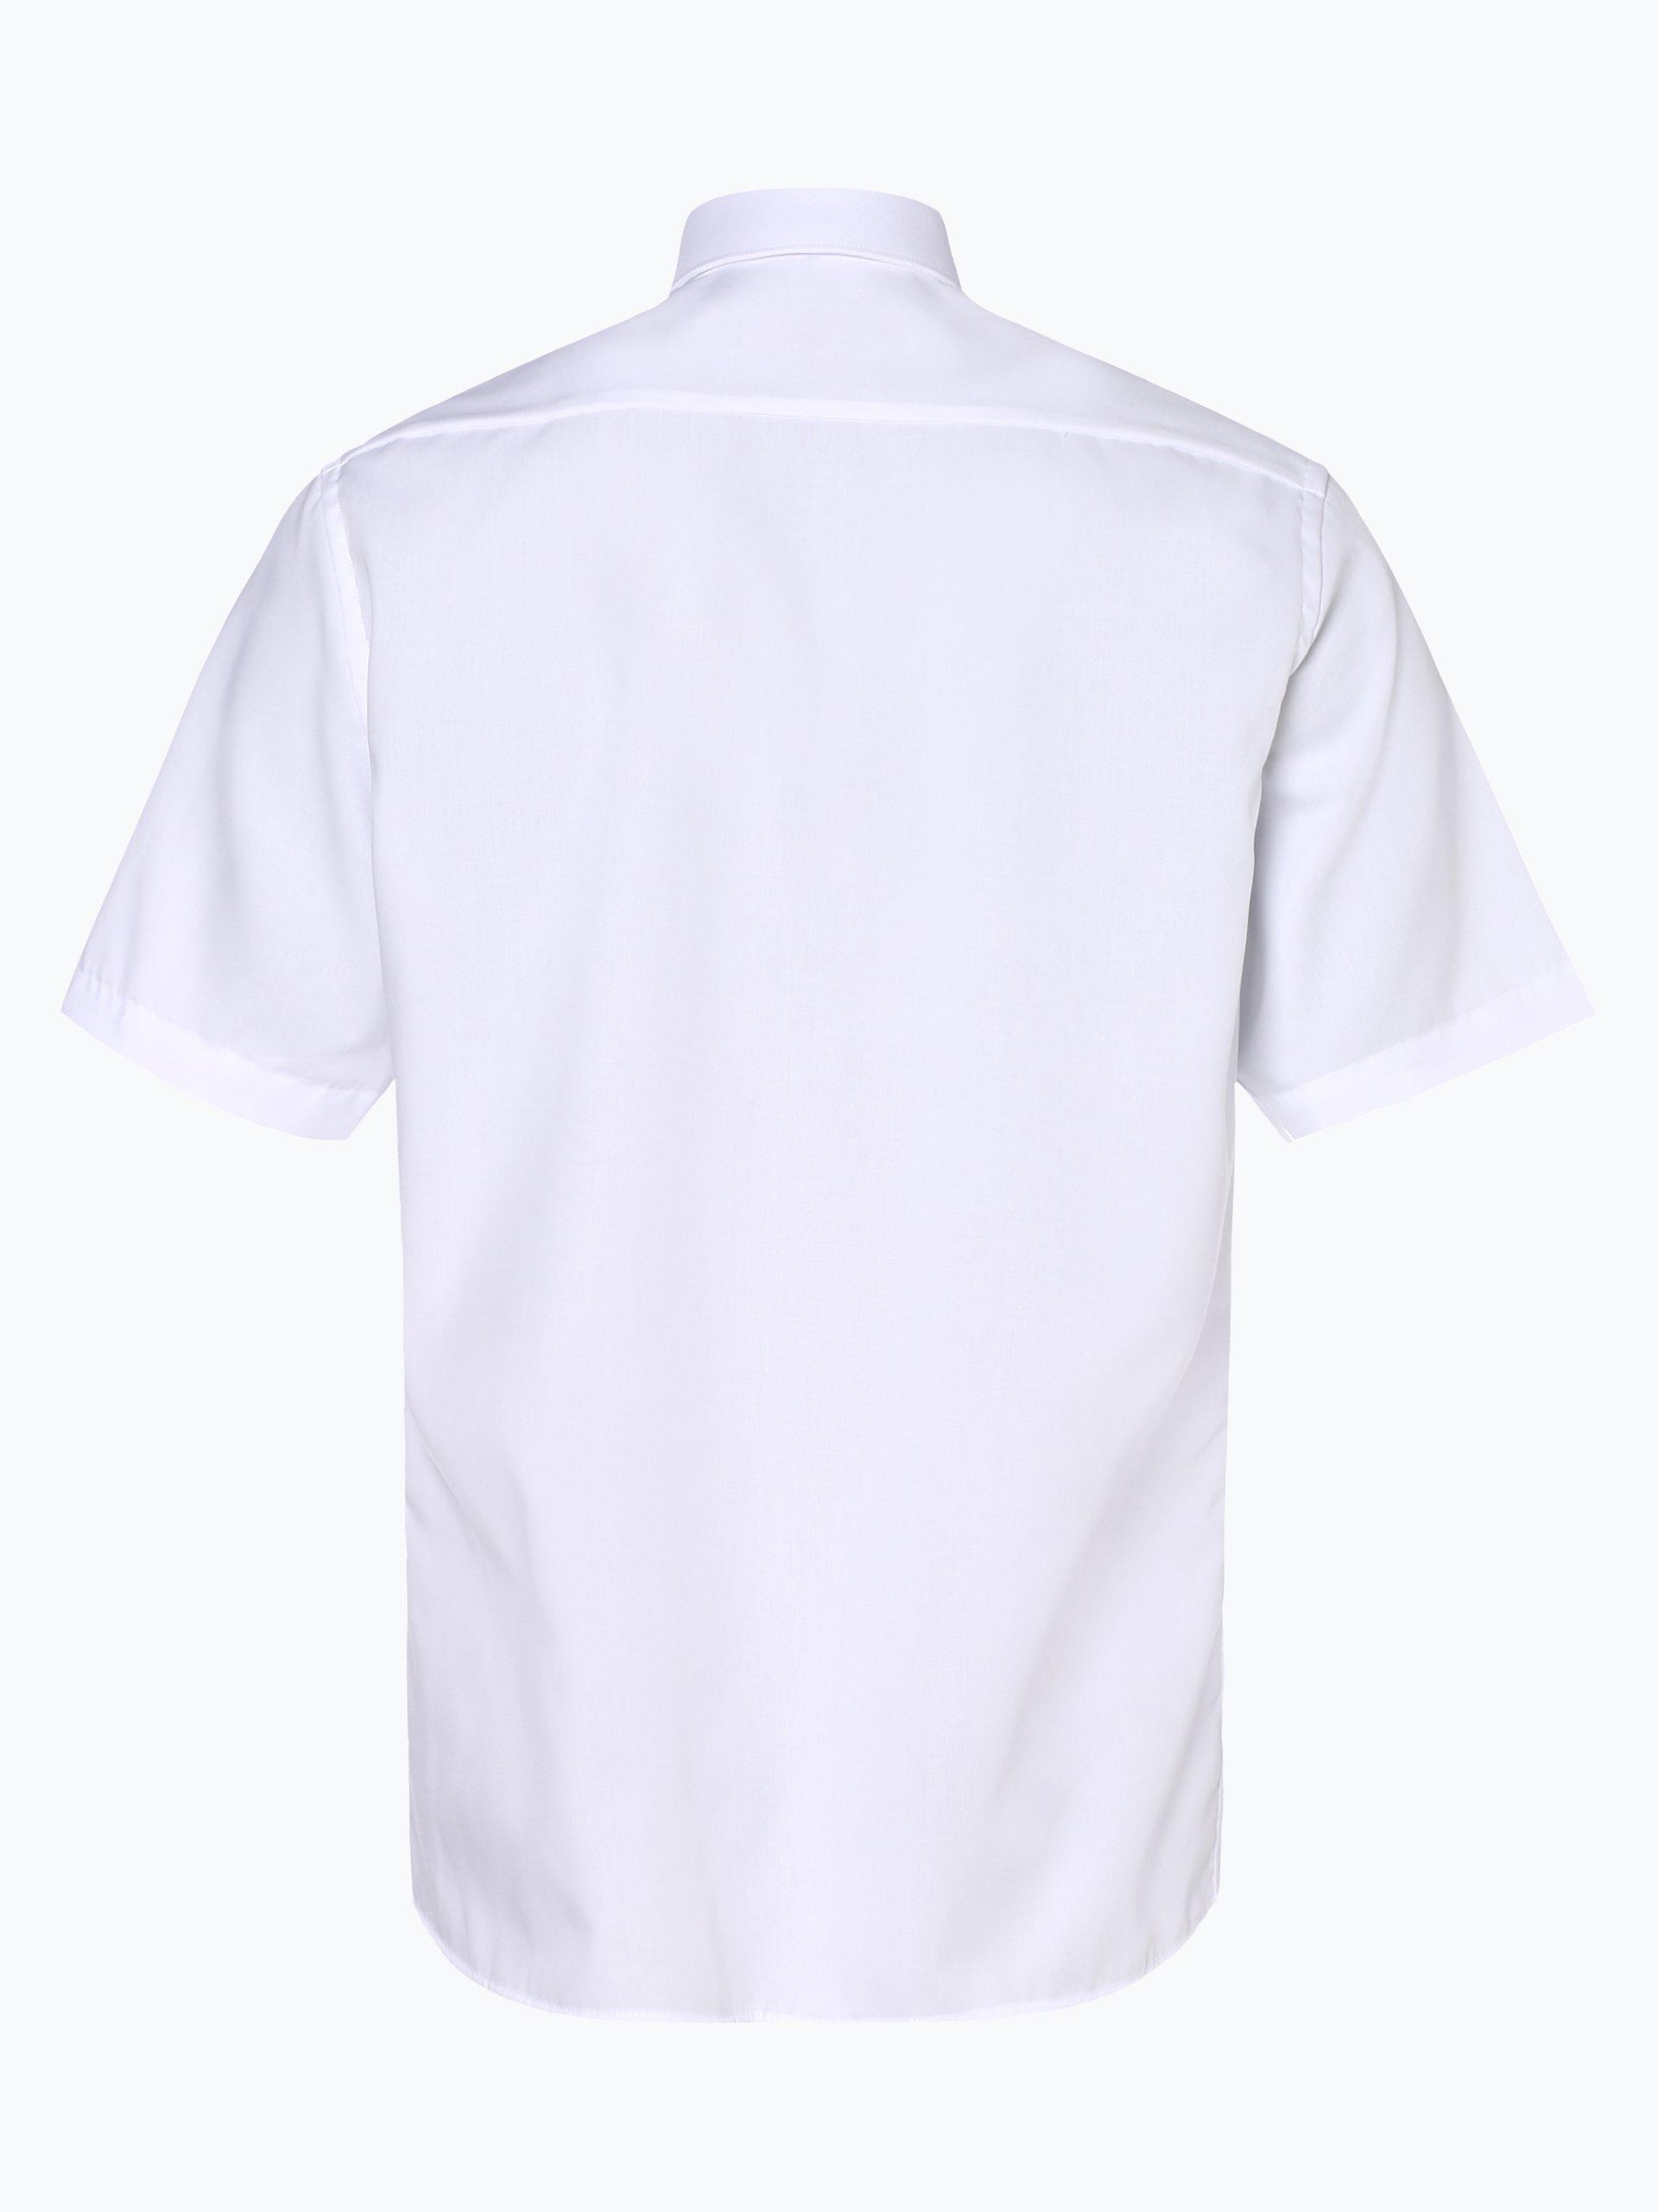 Eterna Modern Fit Herren Hemd - Bügelfrei